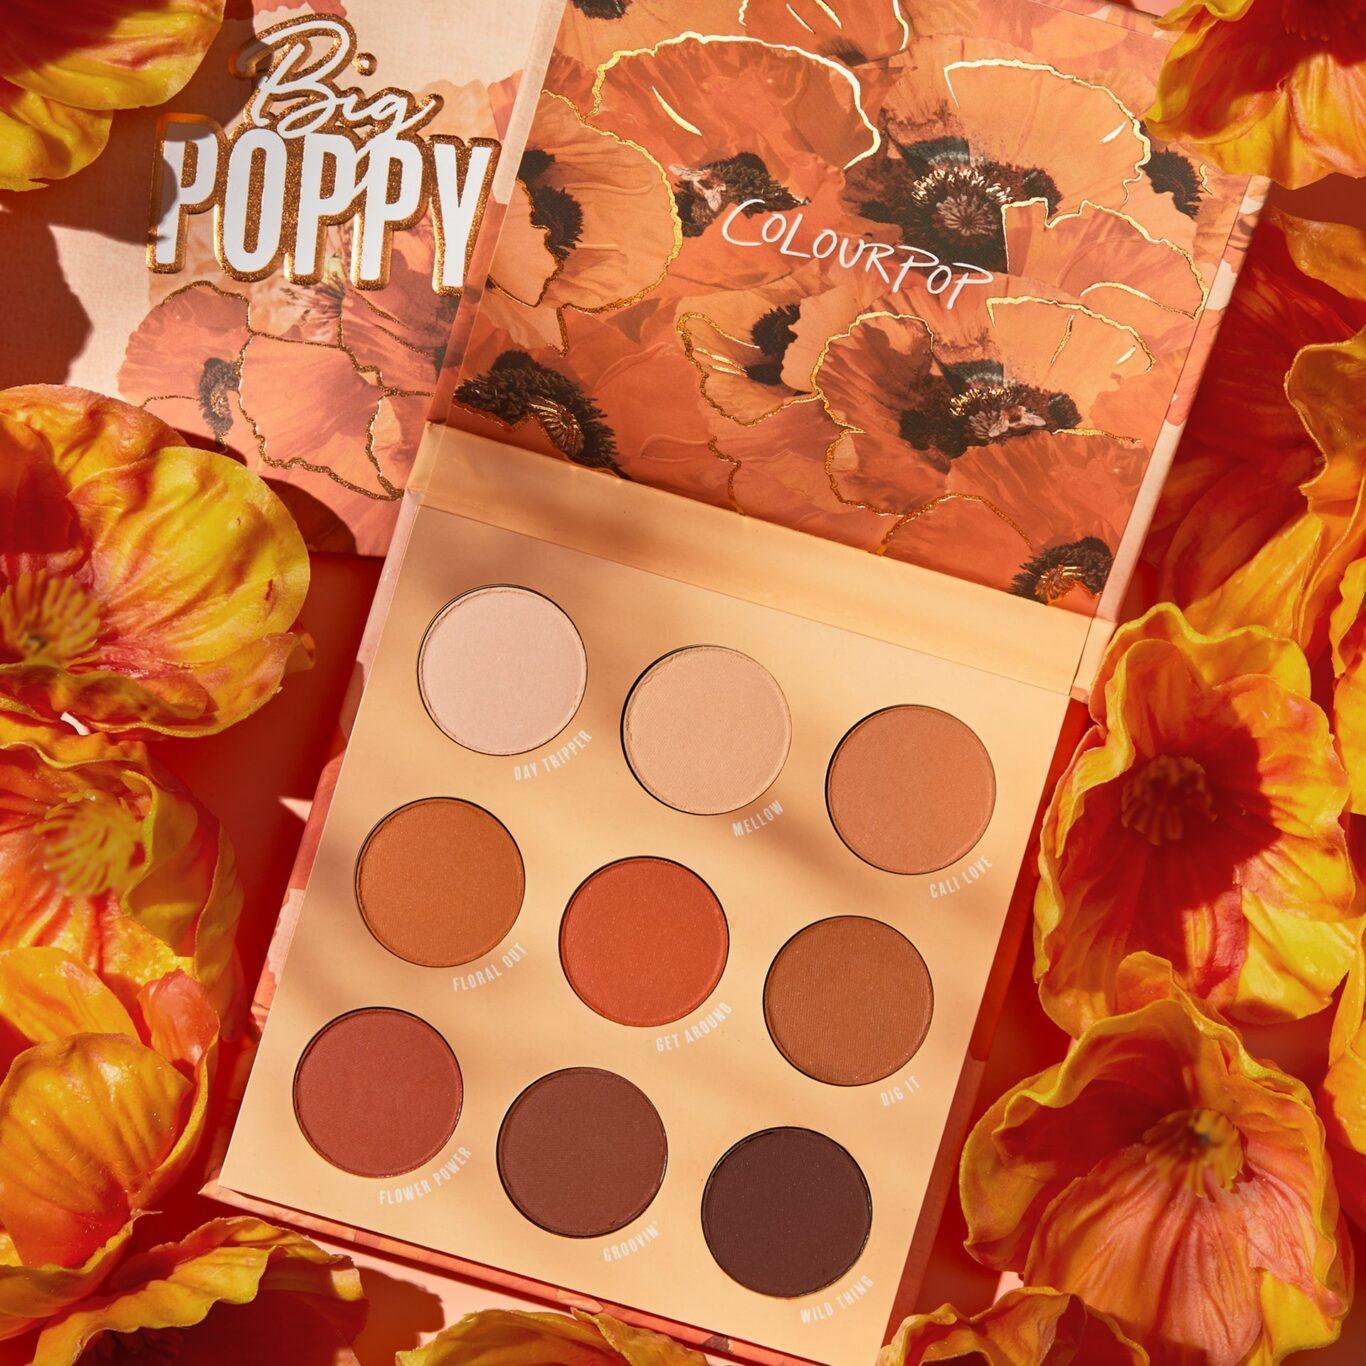 Colourpop Big Poppy Collection Big Poppy Eyeshadow Palette Promo